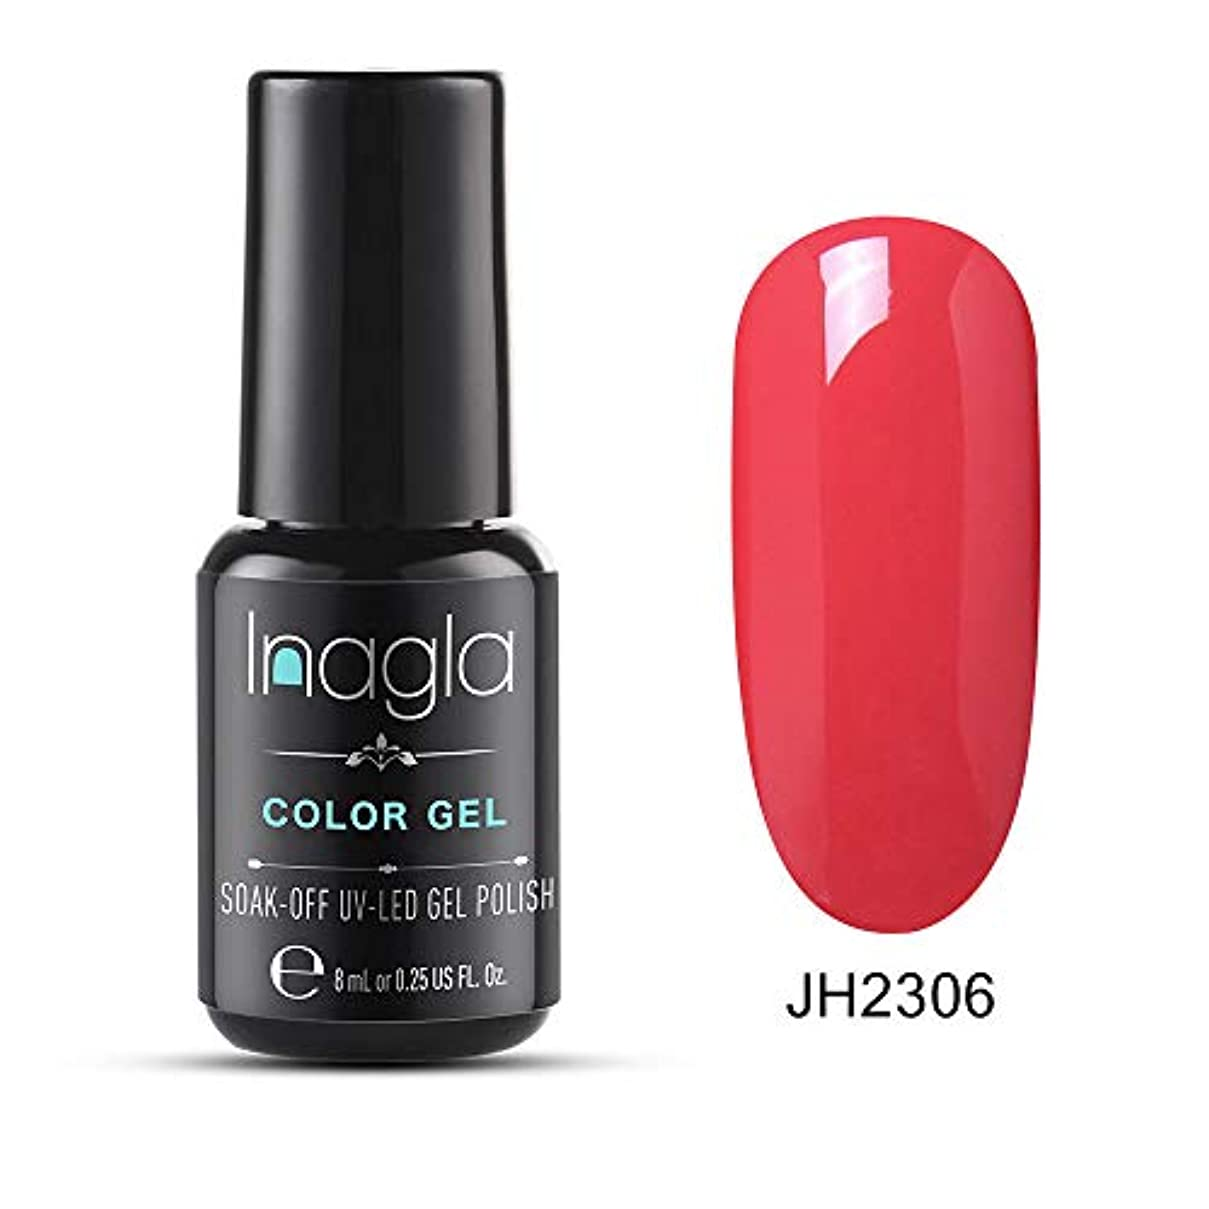 Inagla ジェルネイル カラージェル ワインレッド系 8ml-JH006